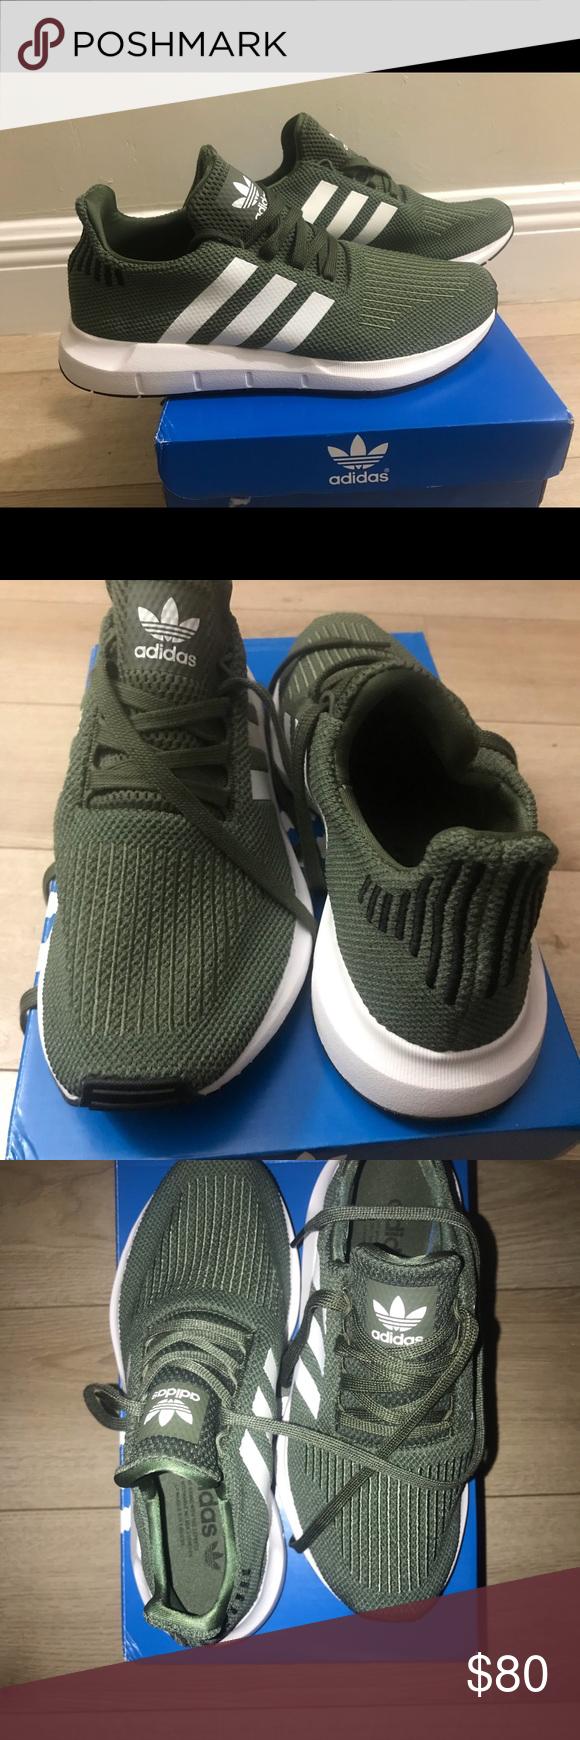 Adidas SWIFT RUN originals. Olive green